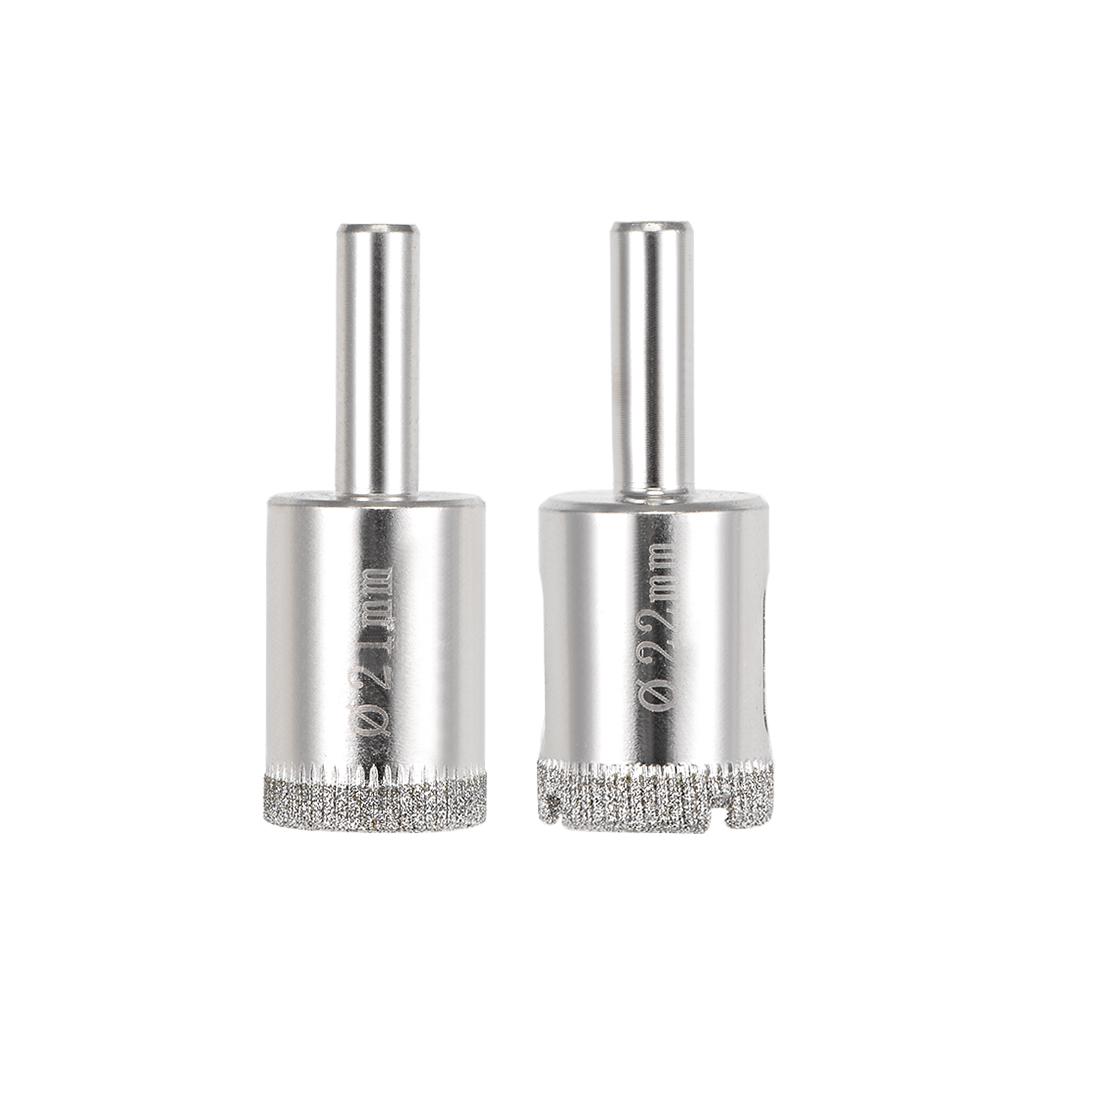 Diamond Drill Bits Set Glass Tile Core Drill Bits Hole Saws 2 Pcs (21mm, 22mm)